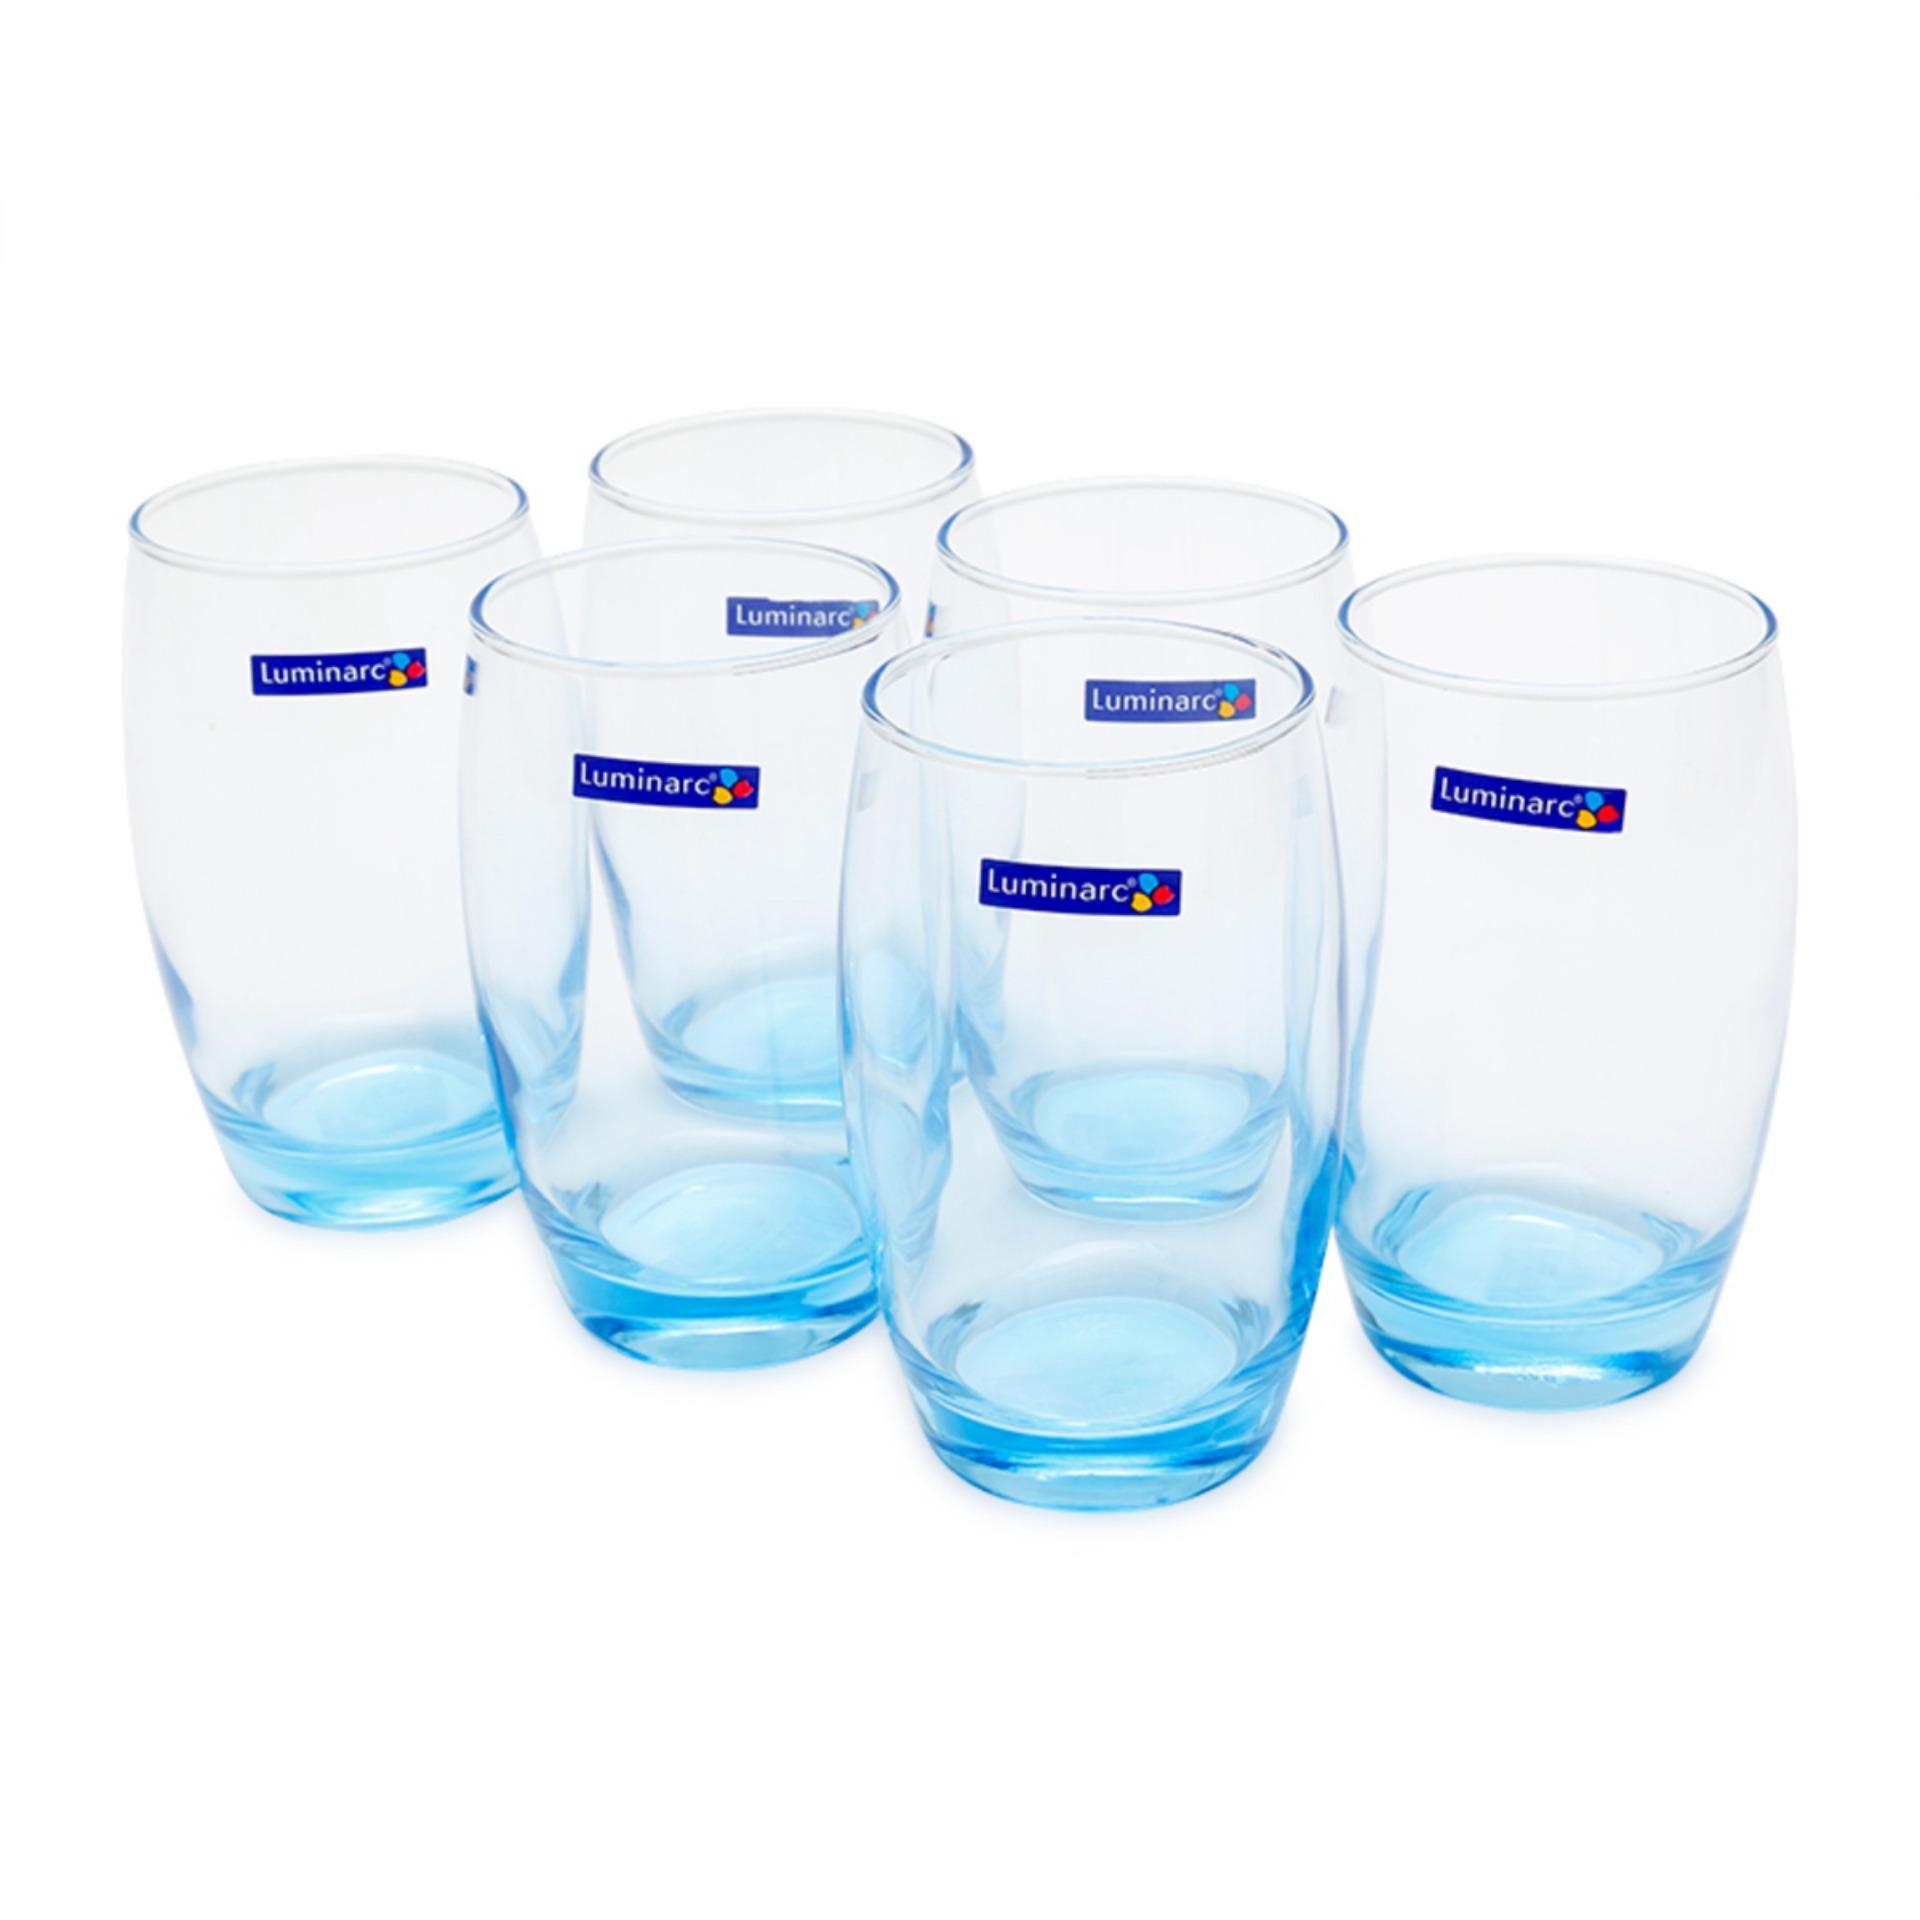 Mua Bộ 6 Ly Thủy Tinh Cao Luminarc Salto Ice Blue 350Ml J1585 Rẻ